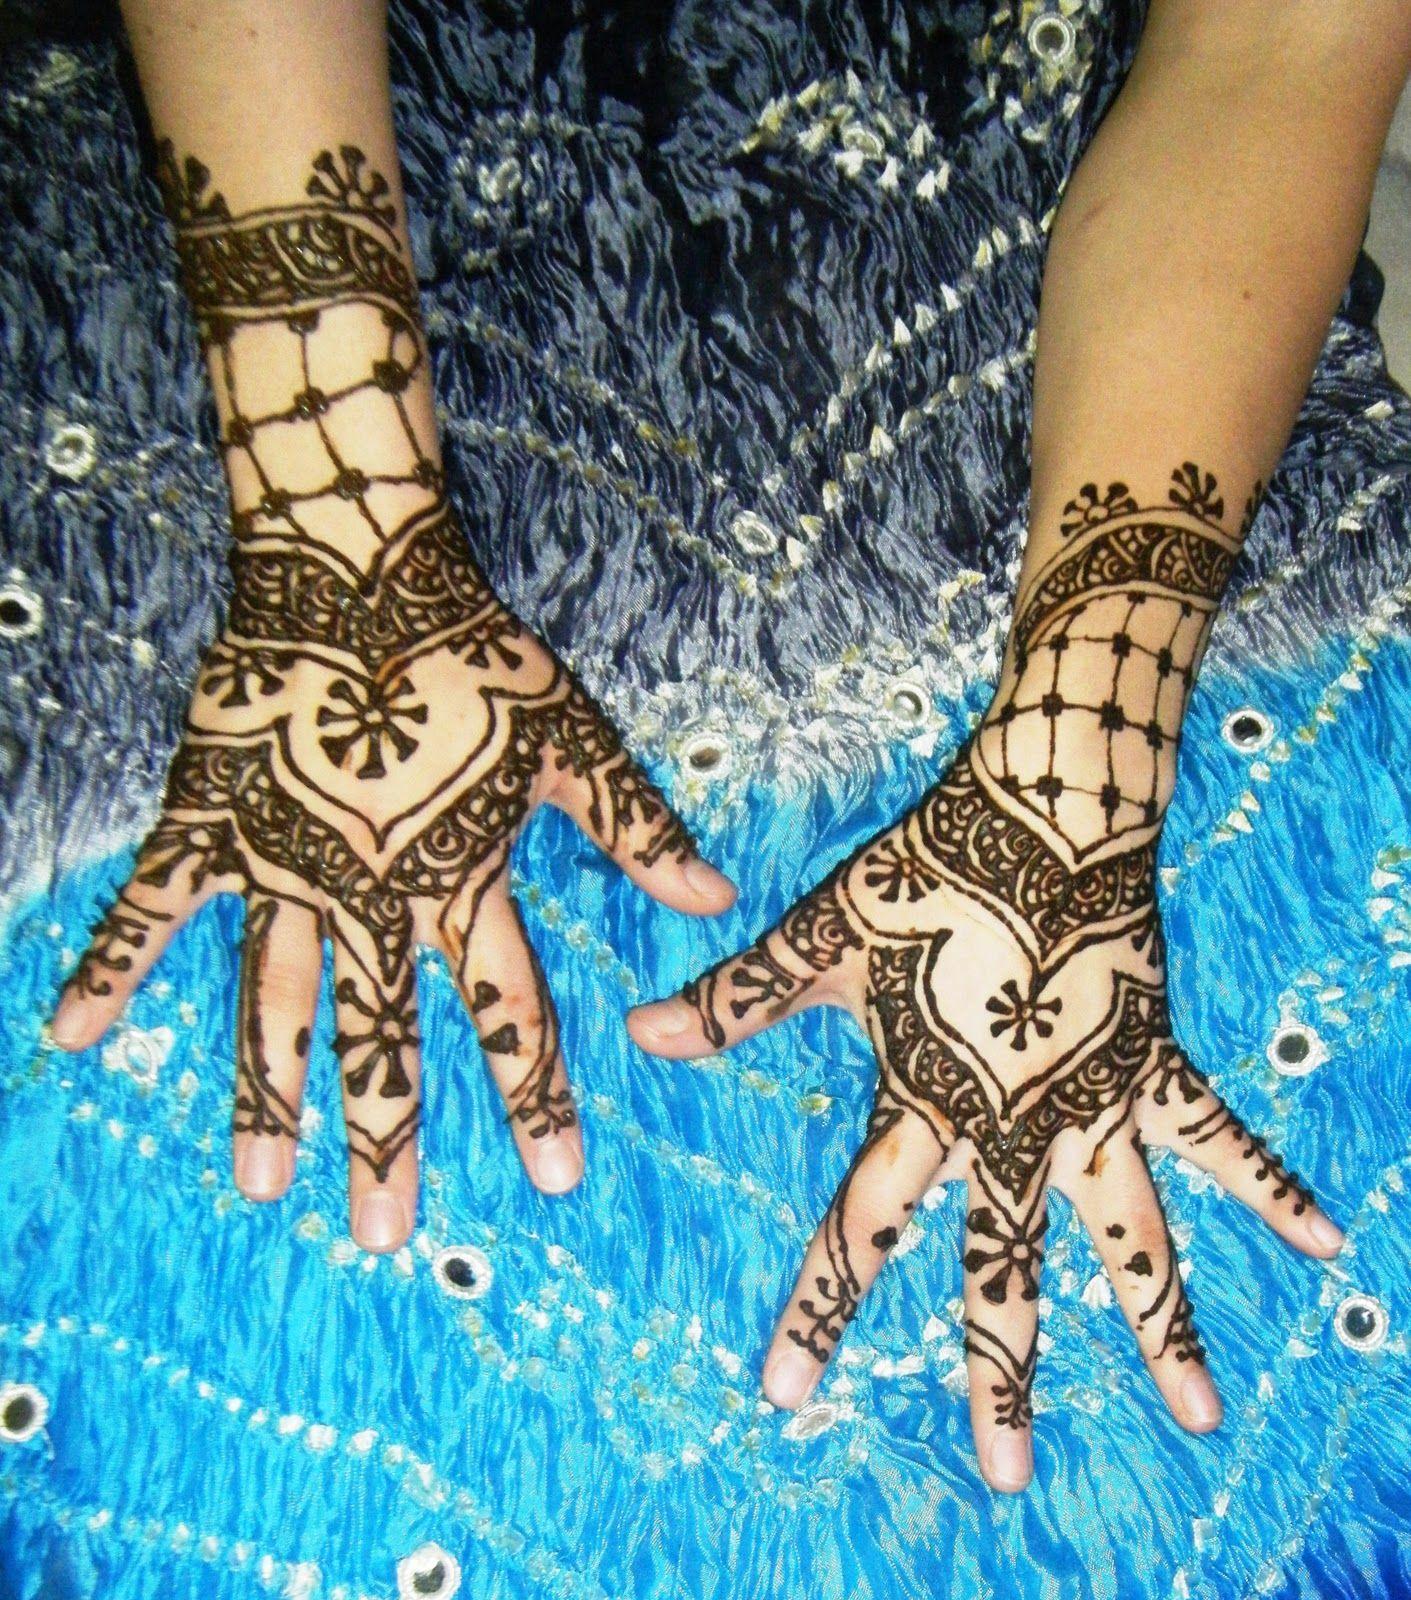 East Indian Henna Tattoo: Professional Henna Artist: Afghani, Indian, Arabic